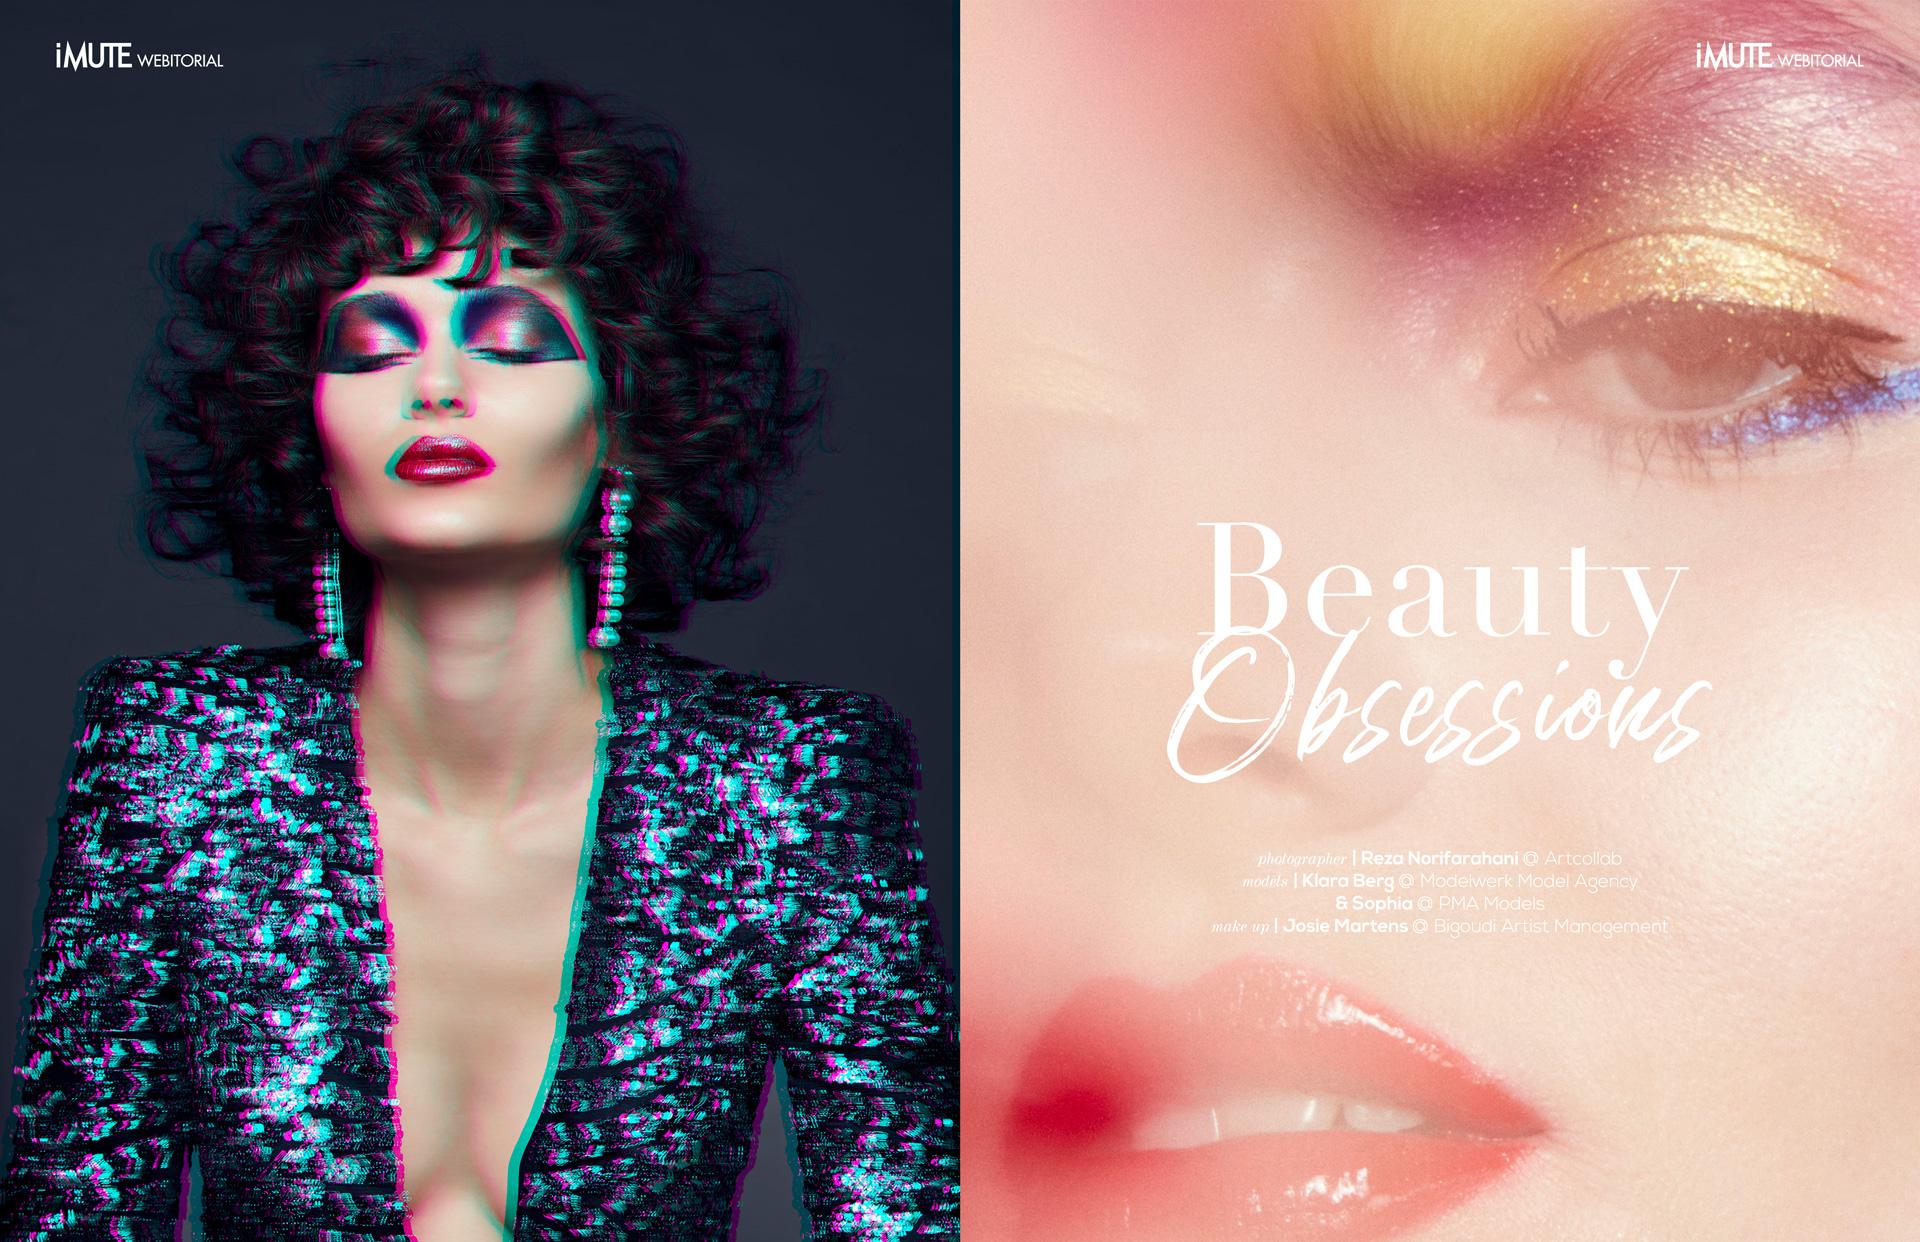 Beauty Obsessions webitorial for iMute Magazine Photographer & Video|Reza Norifarahani @ Artcollab Models| Klara Berg @Modelwerk Model Agency & Sophia @PMA Models Makeup|Josie Martens @ Bigoudi Artist Management